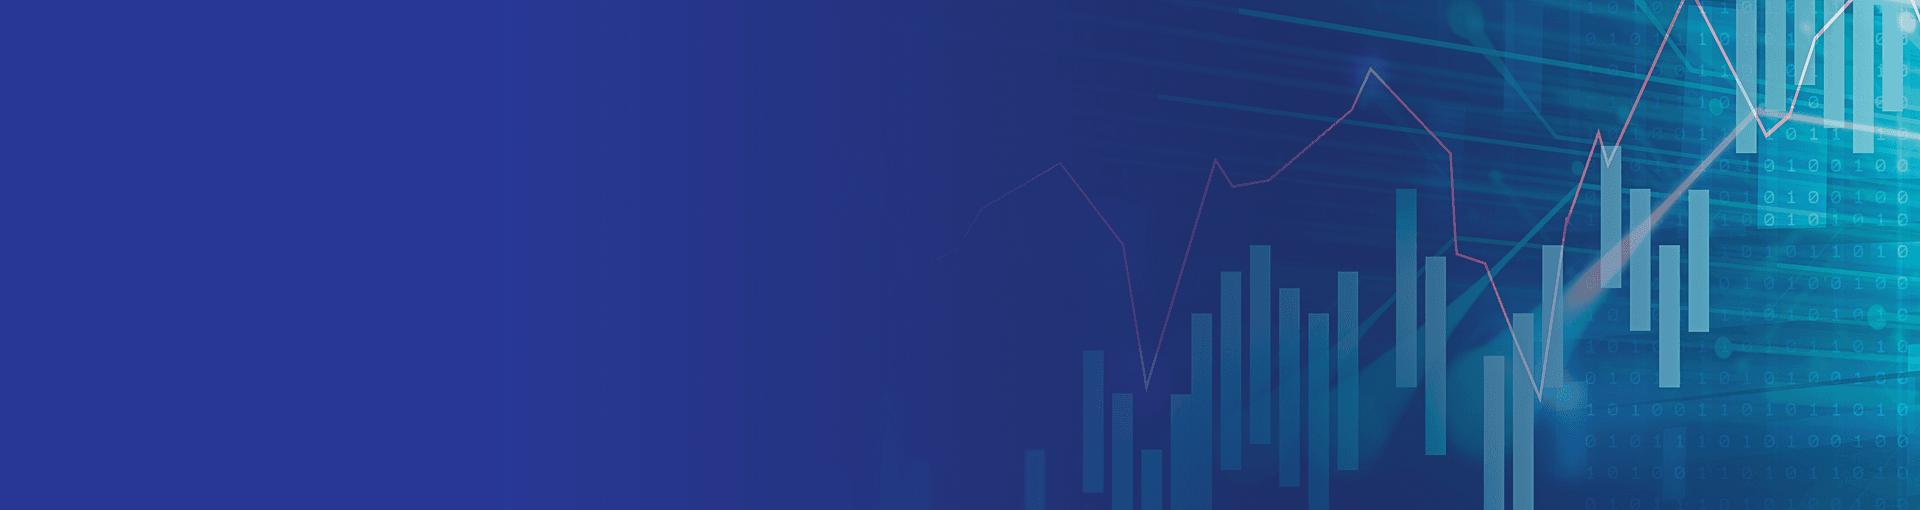 secteur-financier